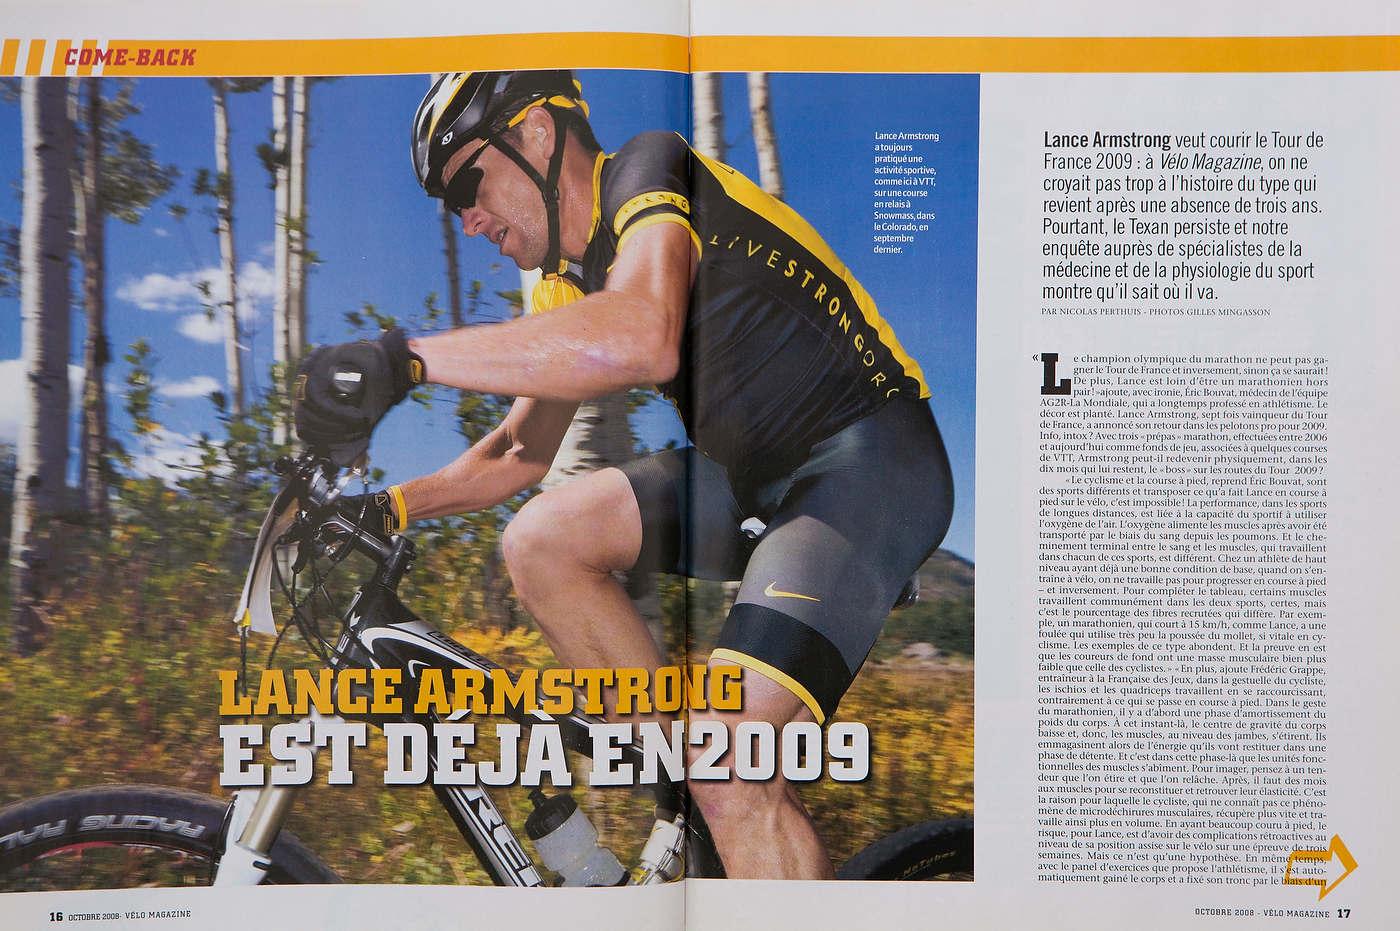 Velo Magazine (France).